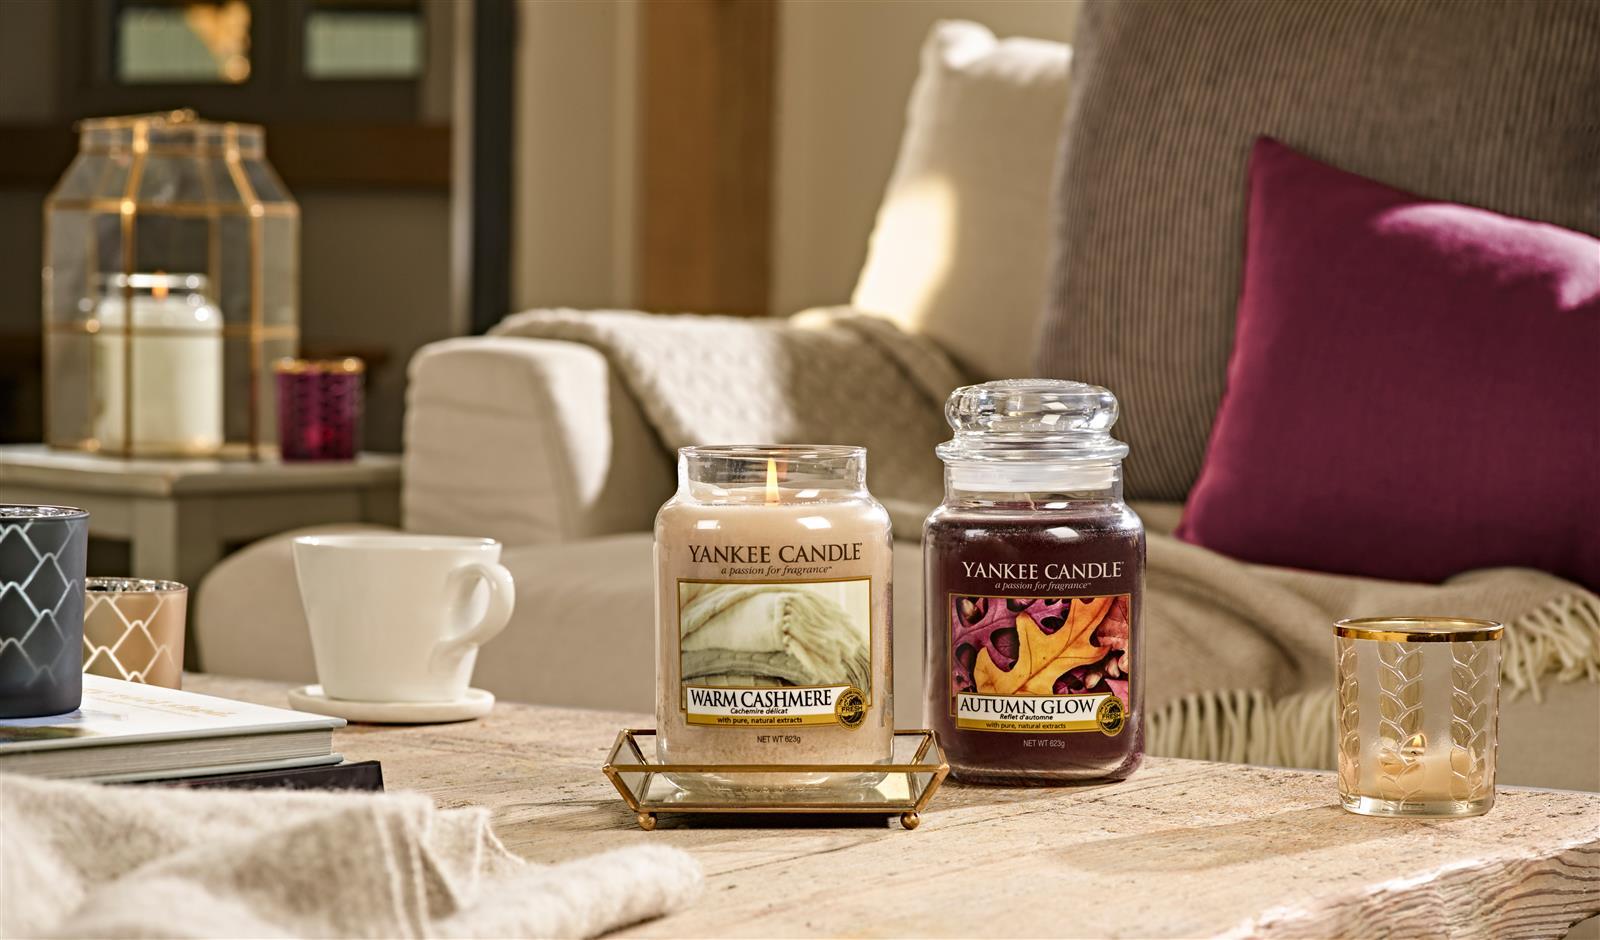 duftkerze housewarmer warm cashmere von yankee candle. Black Bedroom Furniture Sets. Home Design Ideas